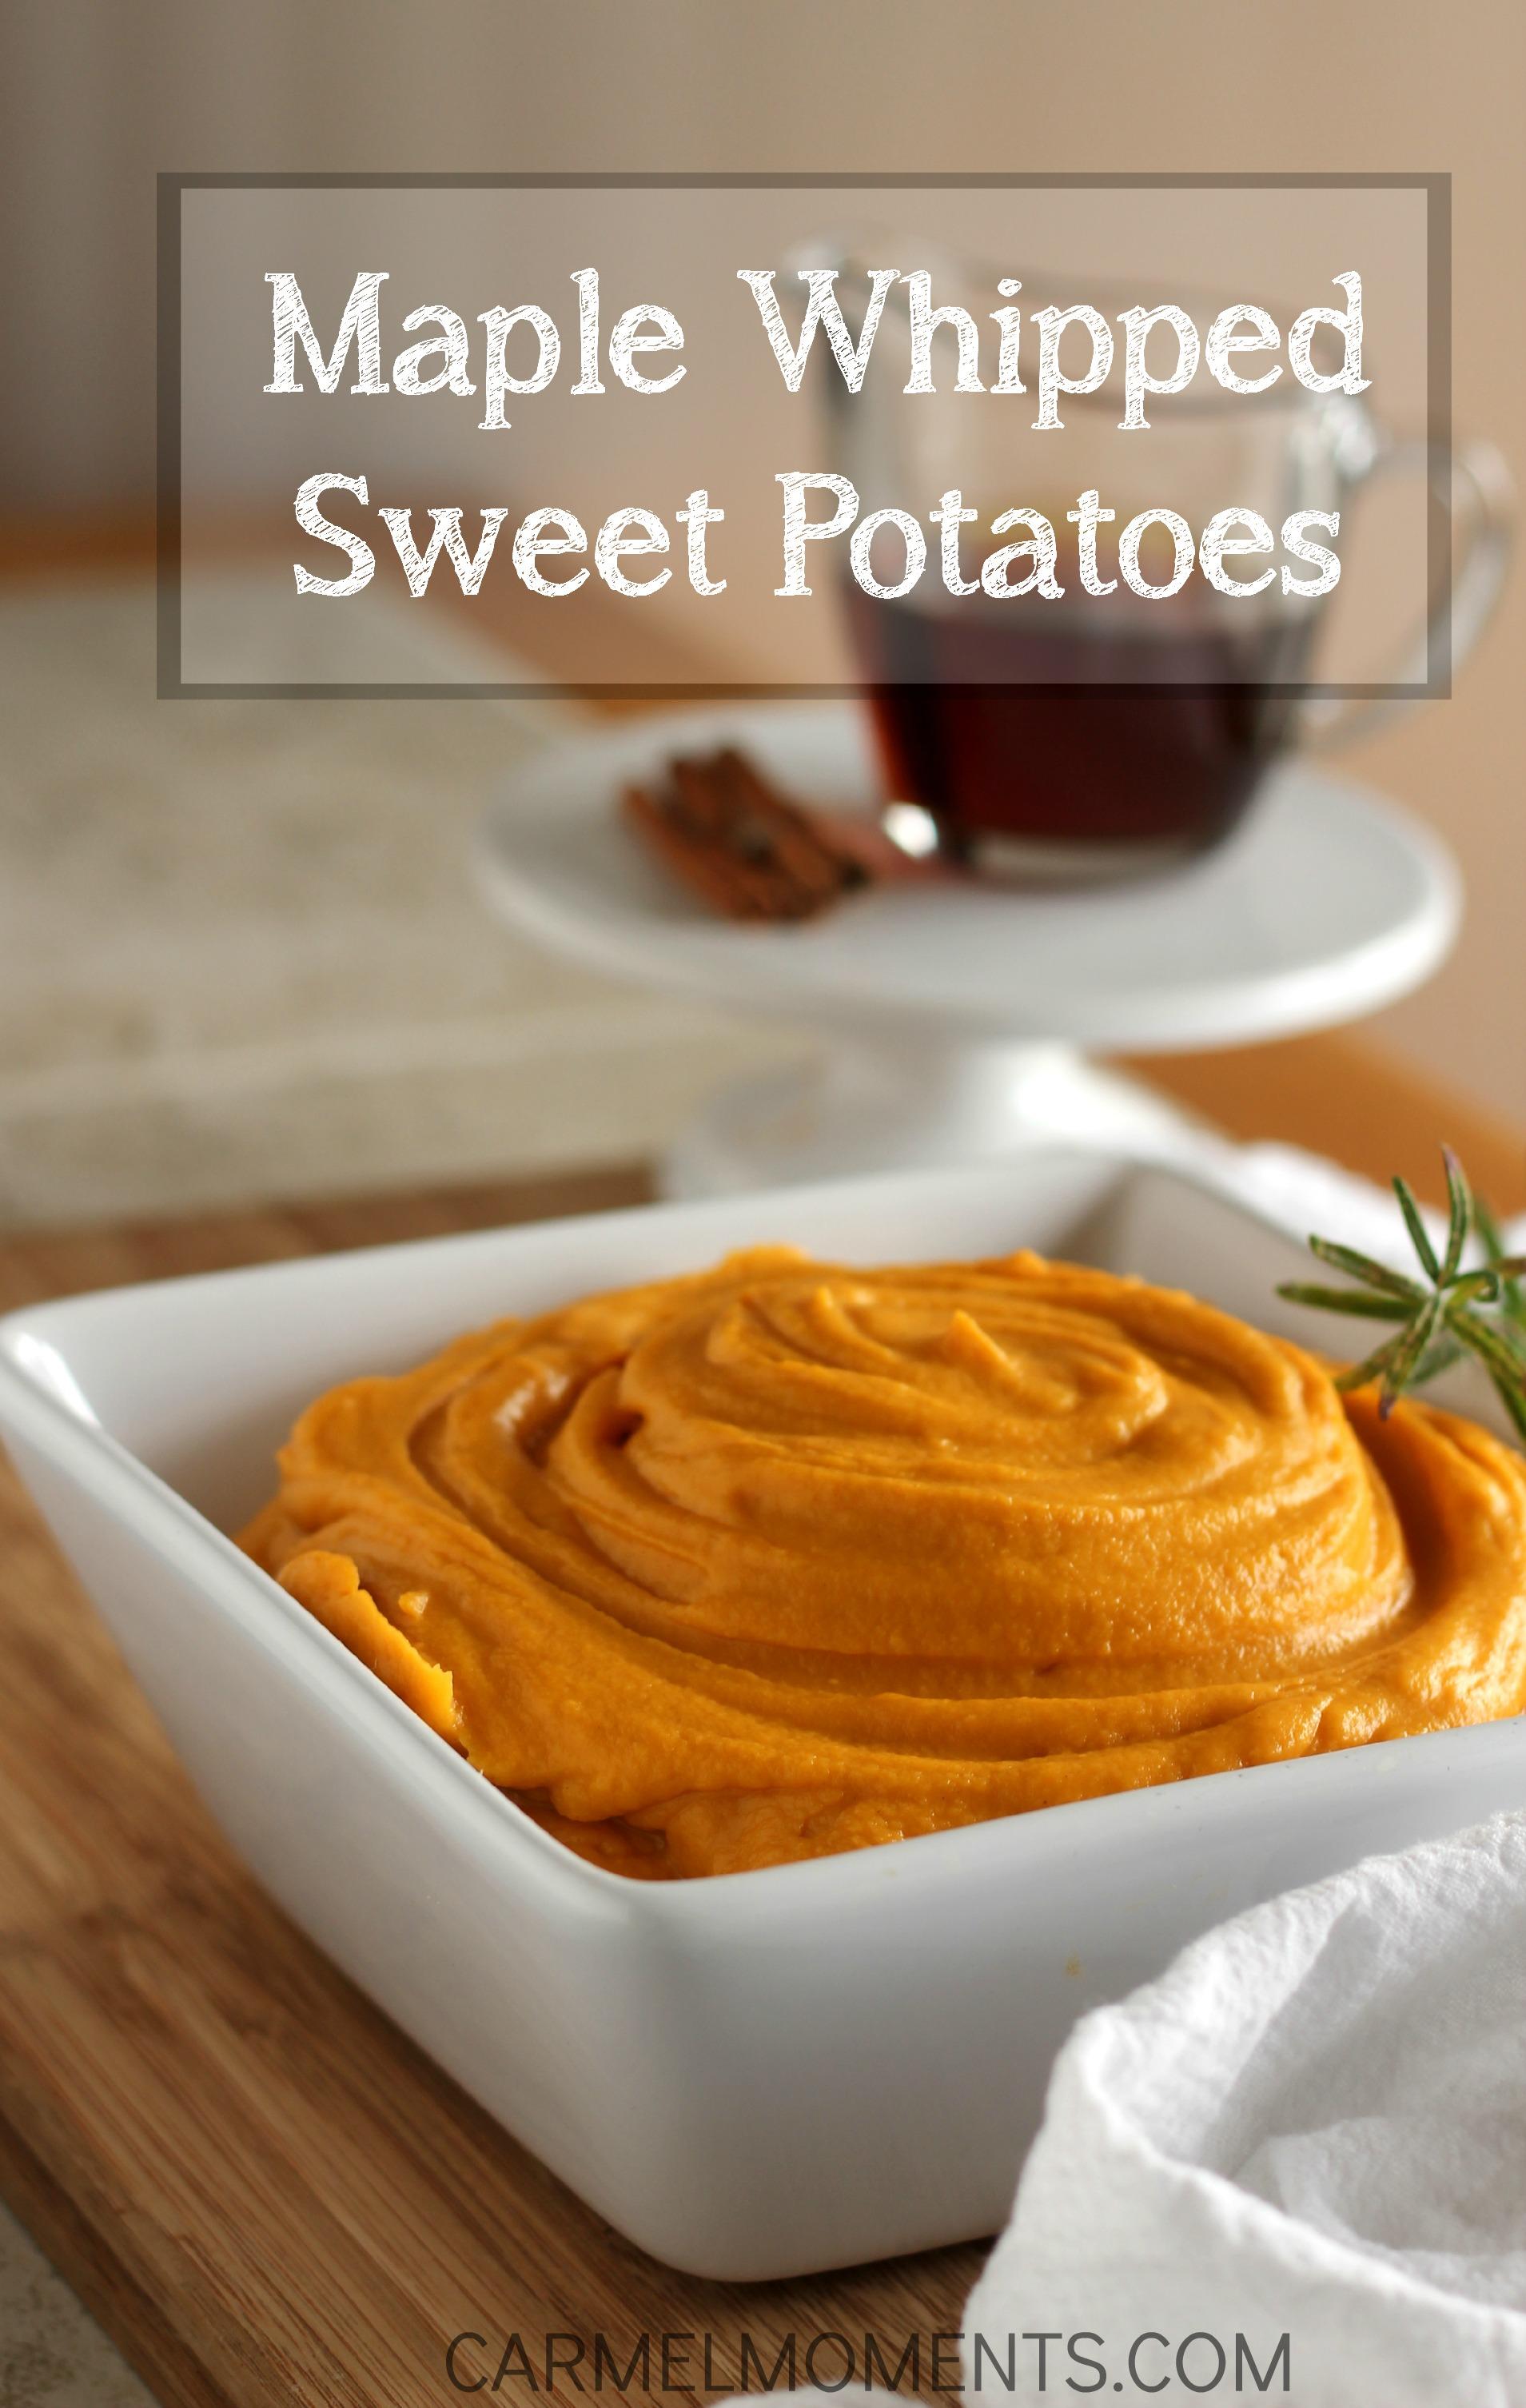 Maple Whipped Sweet Potatoes